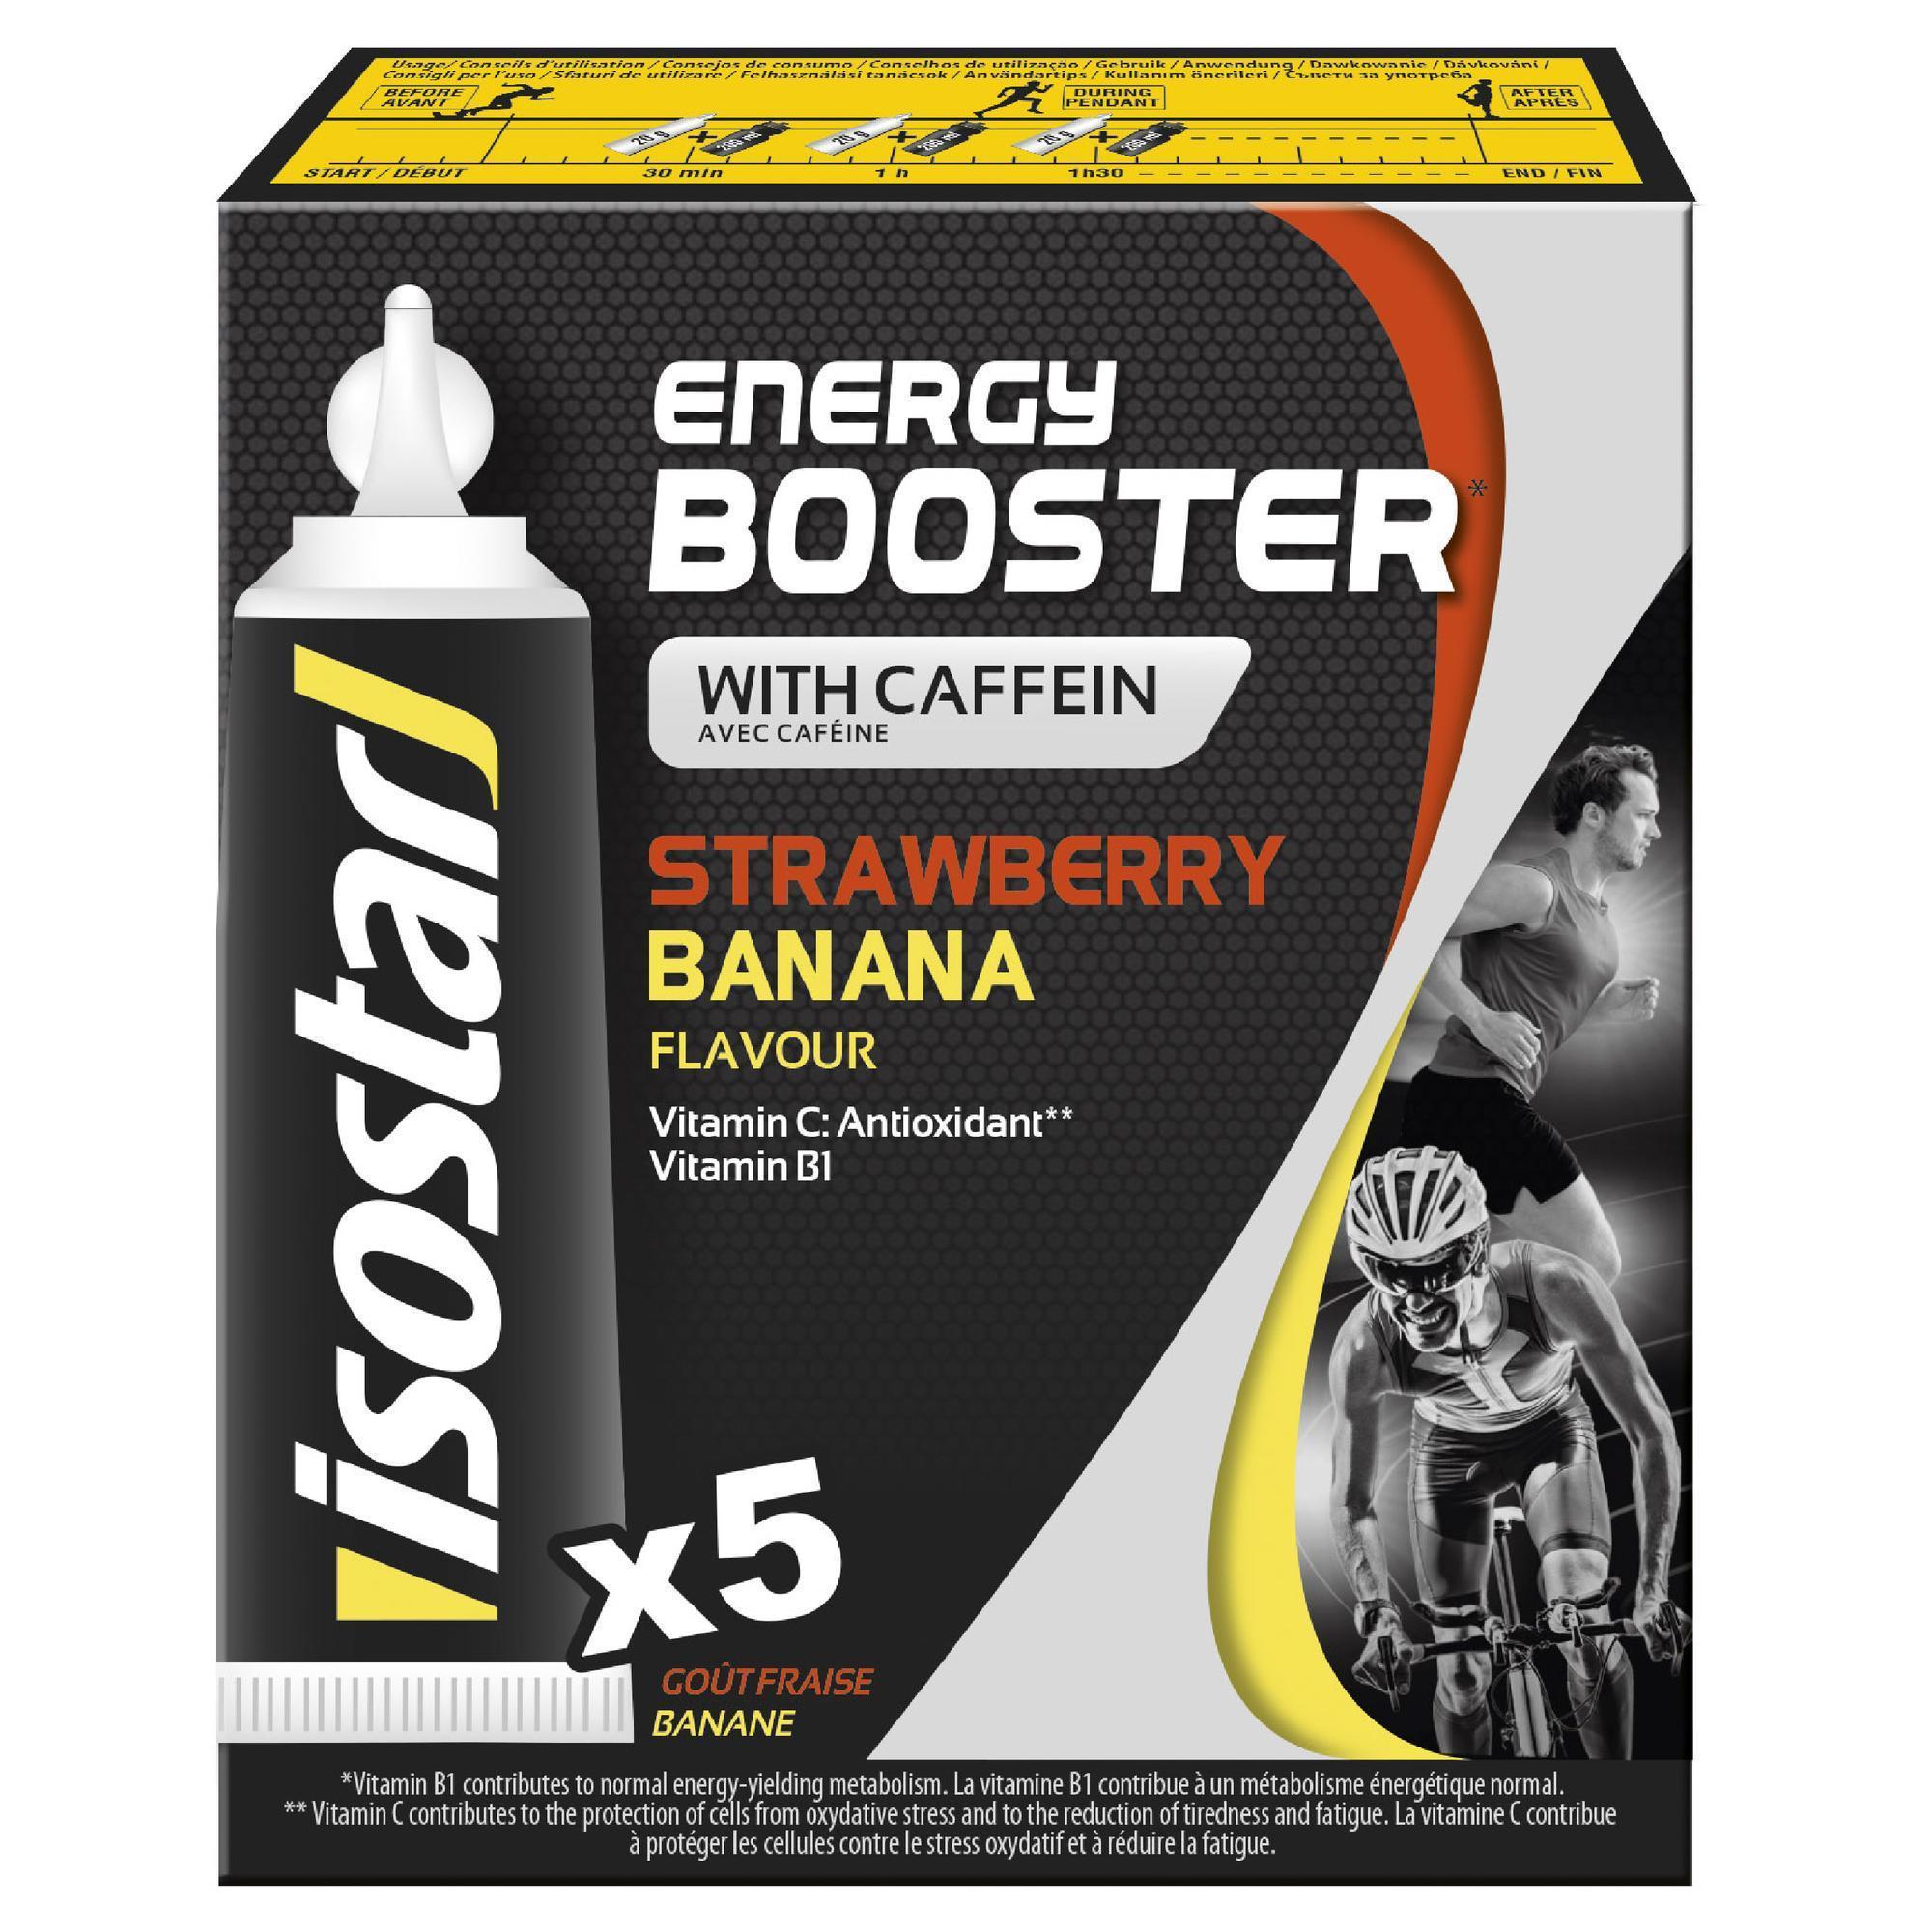 Energygel Energy Booster Erdbeer/Banane 5 x 20 g